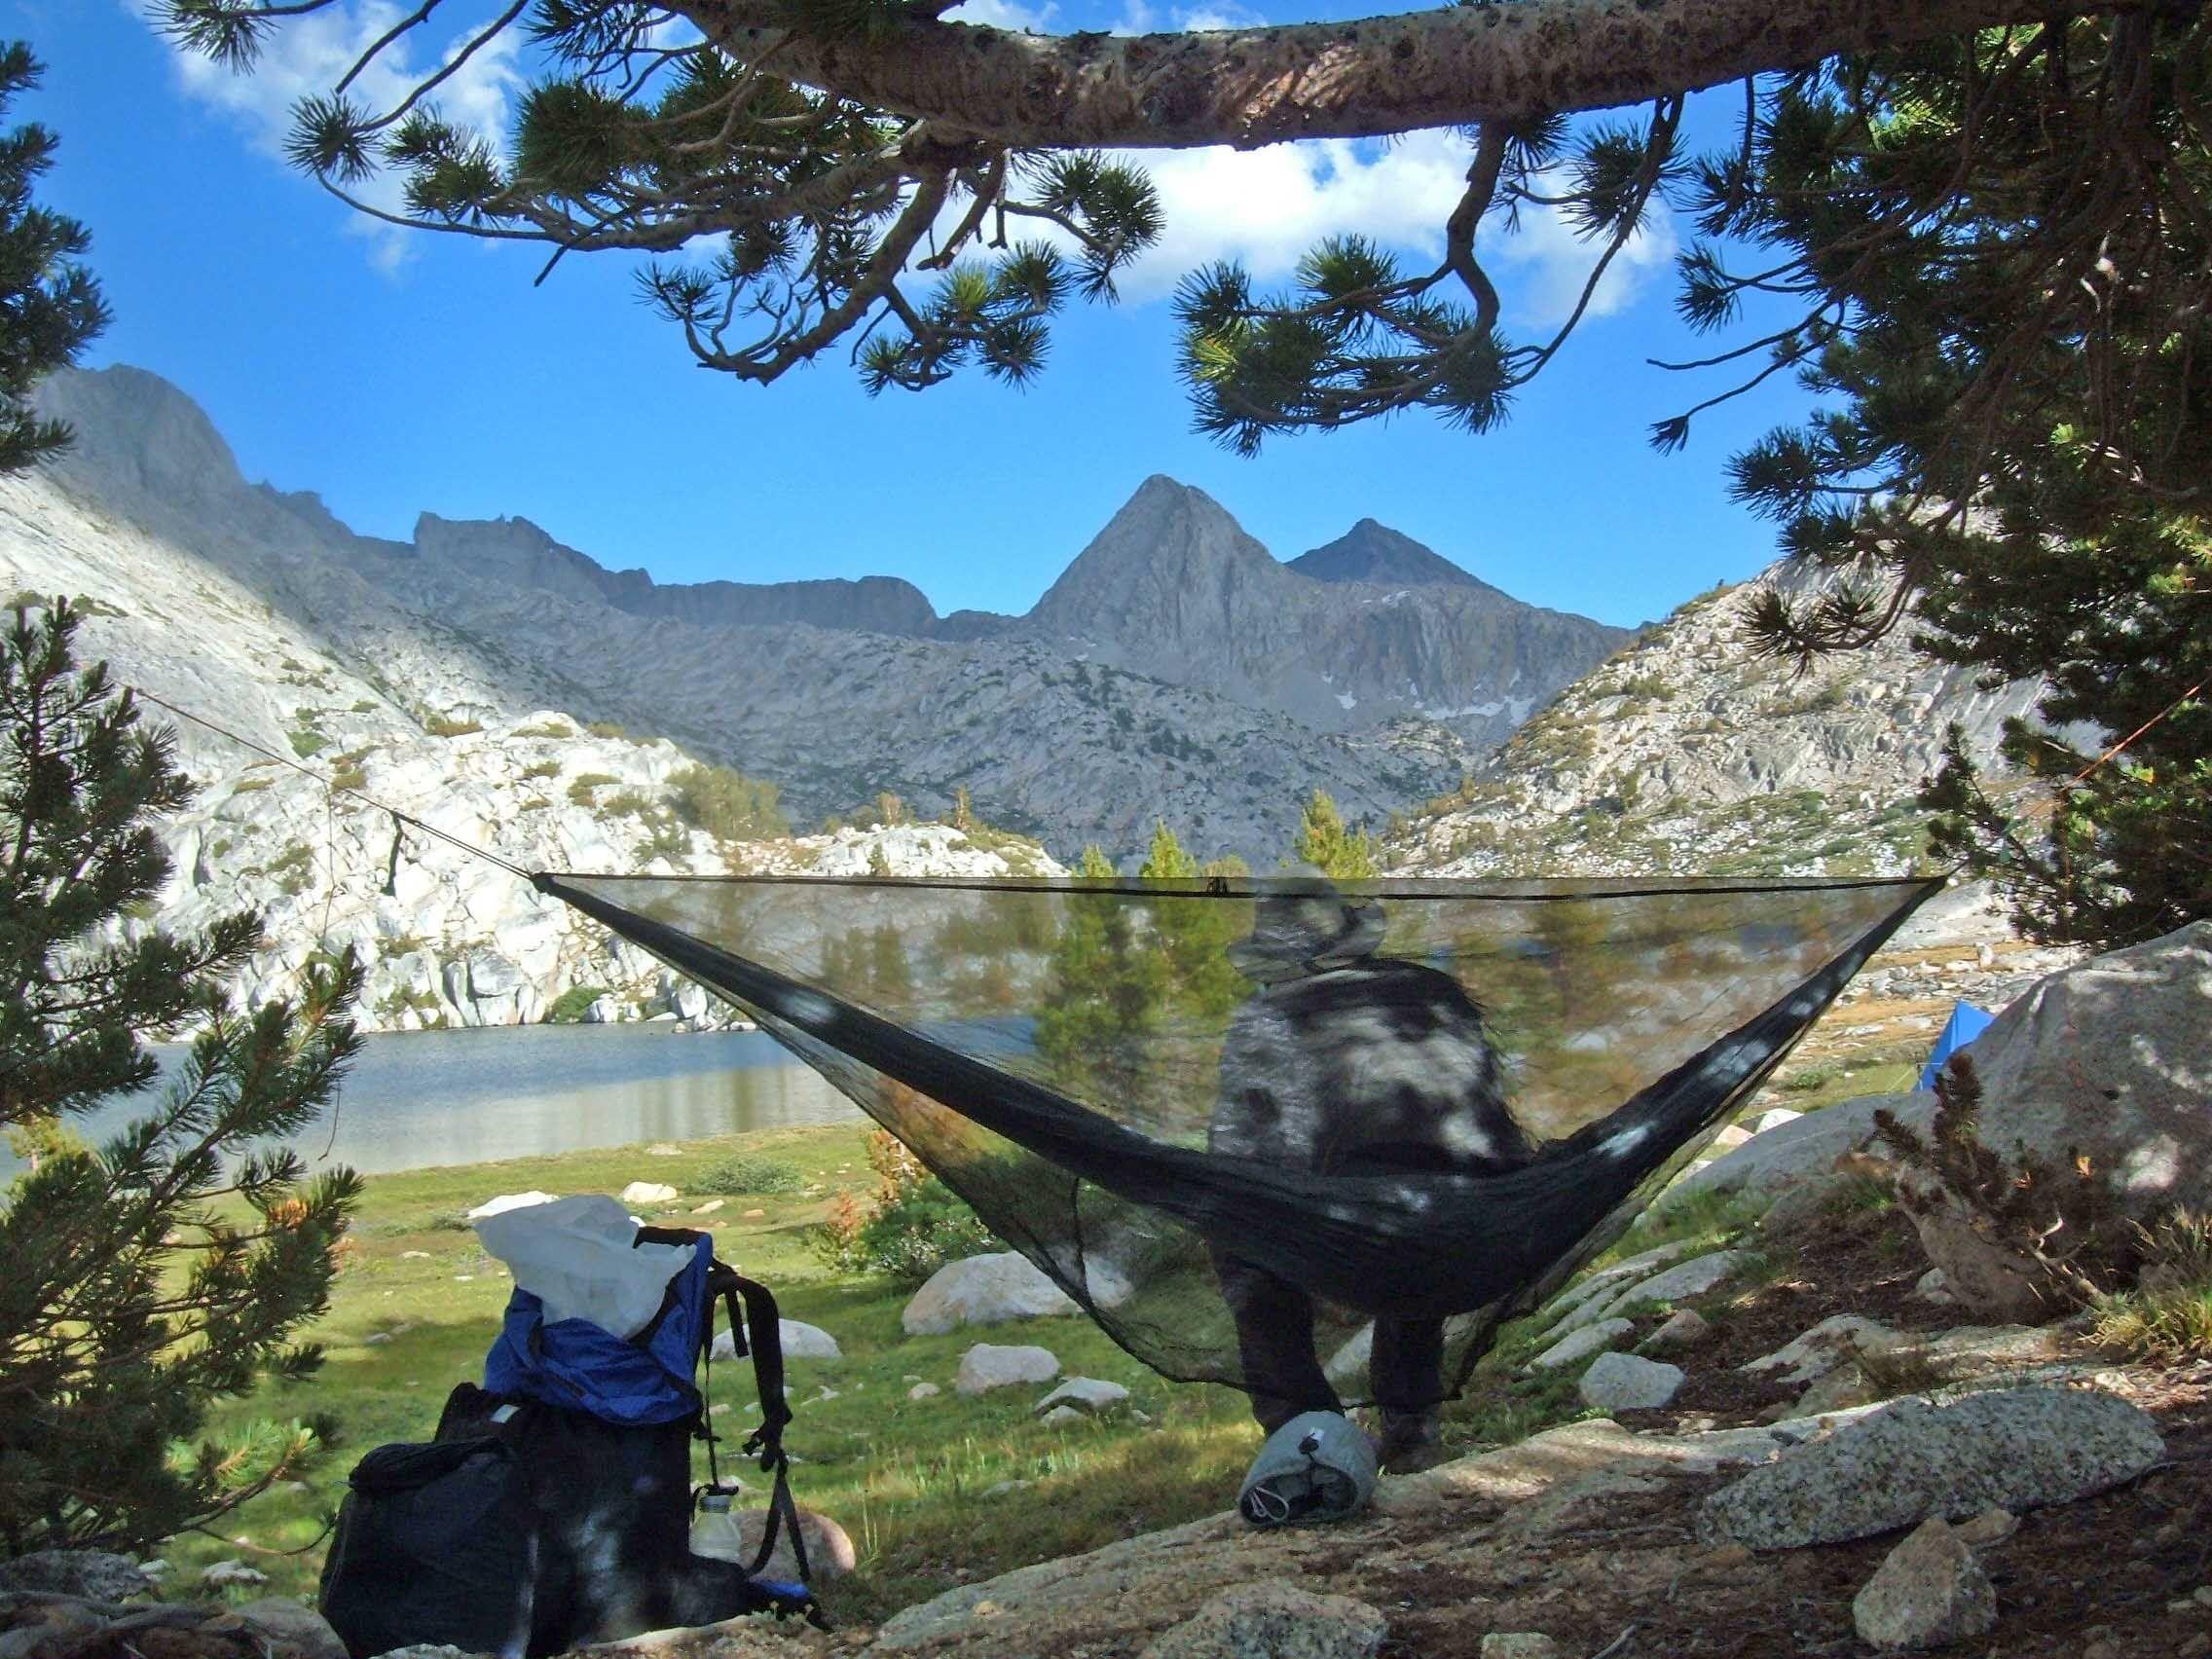 3a95785df66 Hammock Camping - Part II  Types of backpacking hammocks